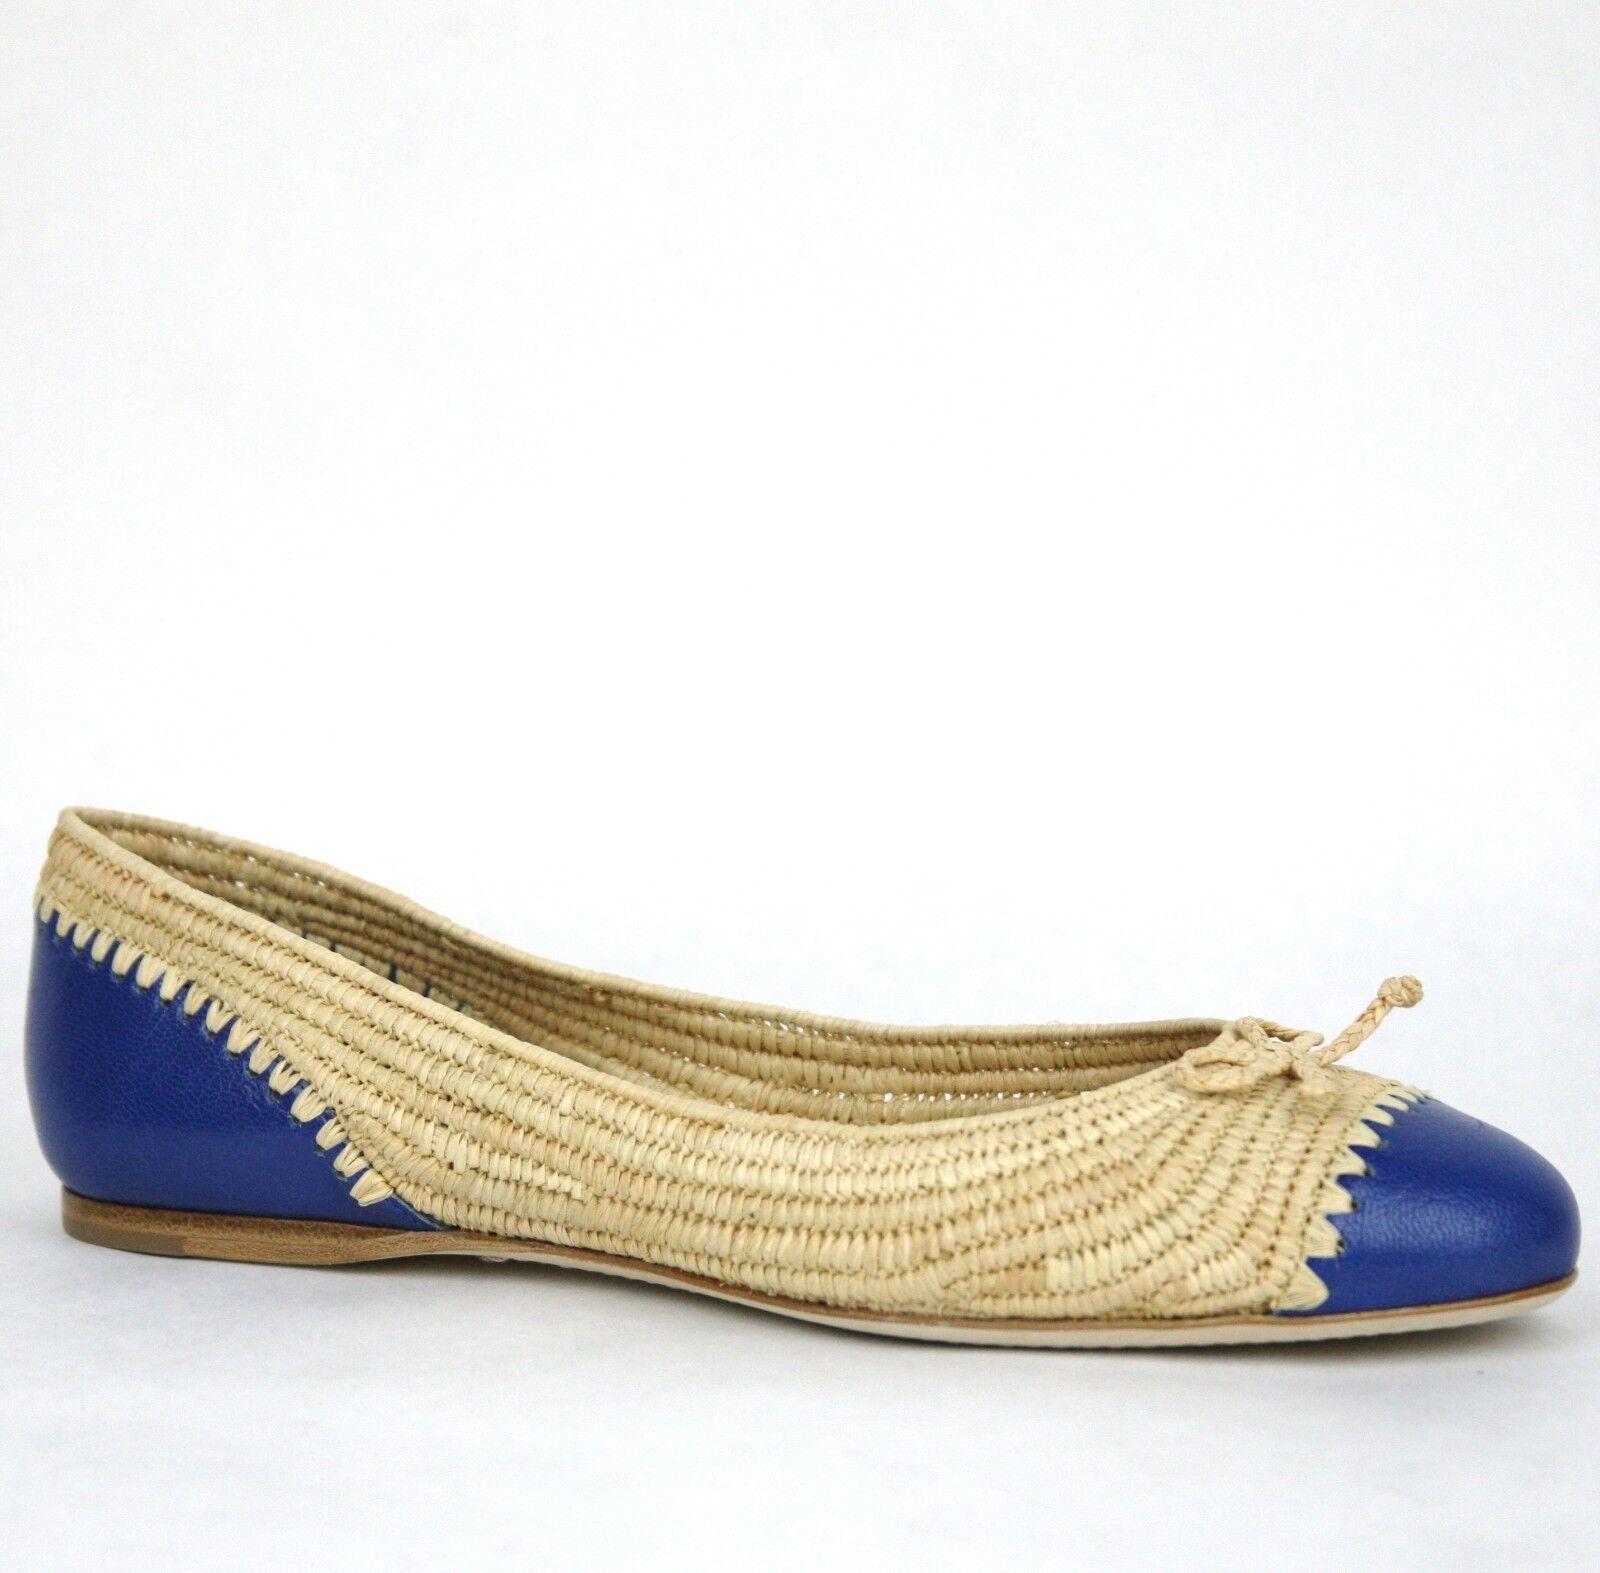 780 Bottega Veneta Straw Leather Ballet Flat w Bow Beige bluee 37.5 338295 9870